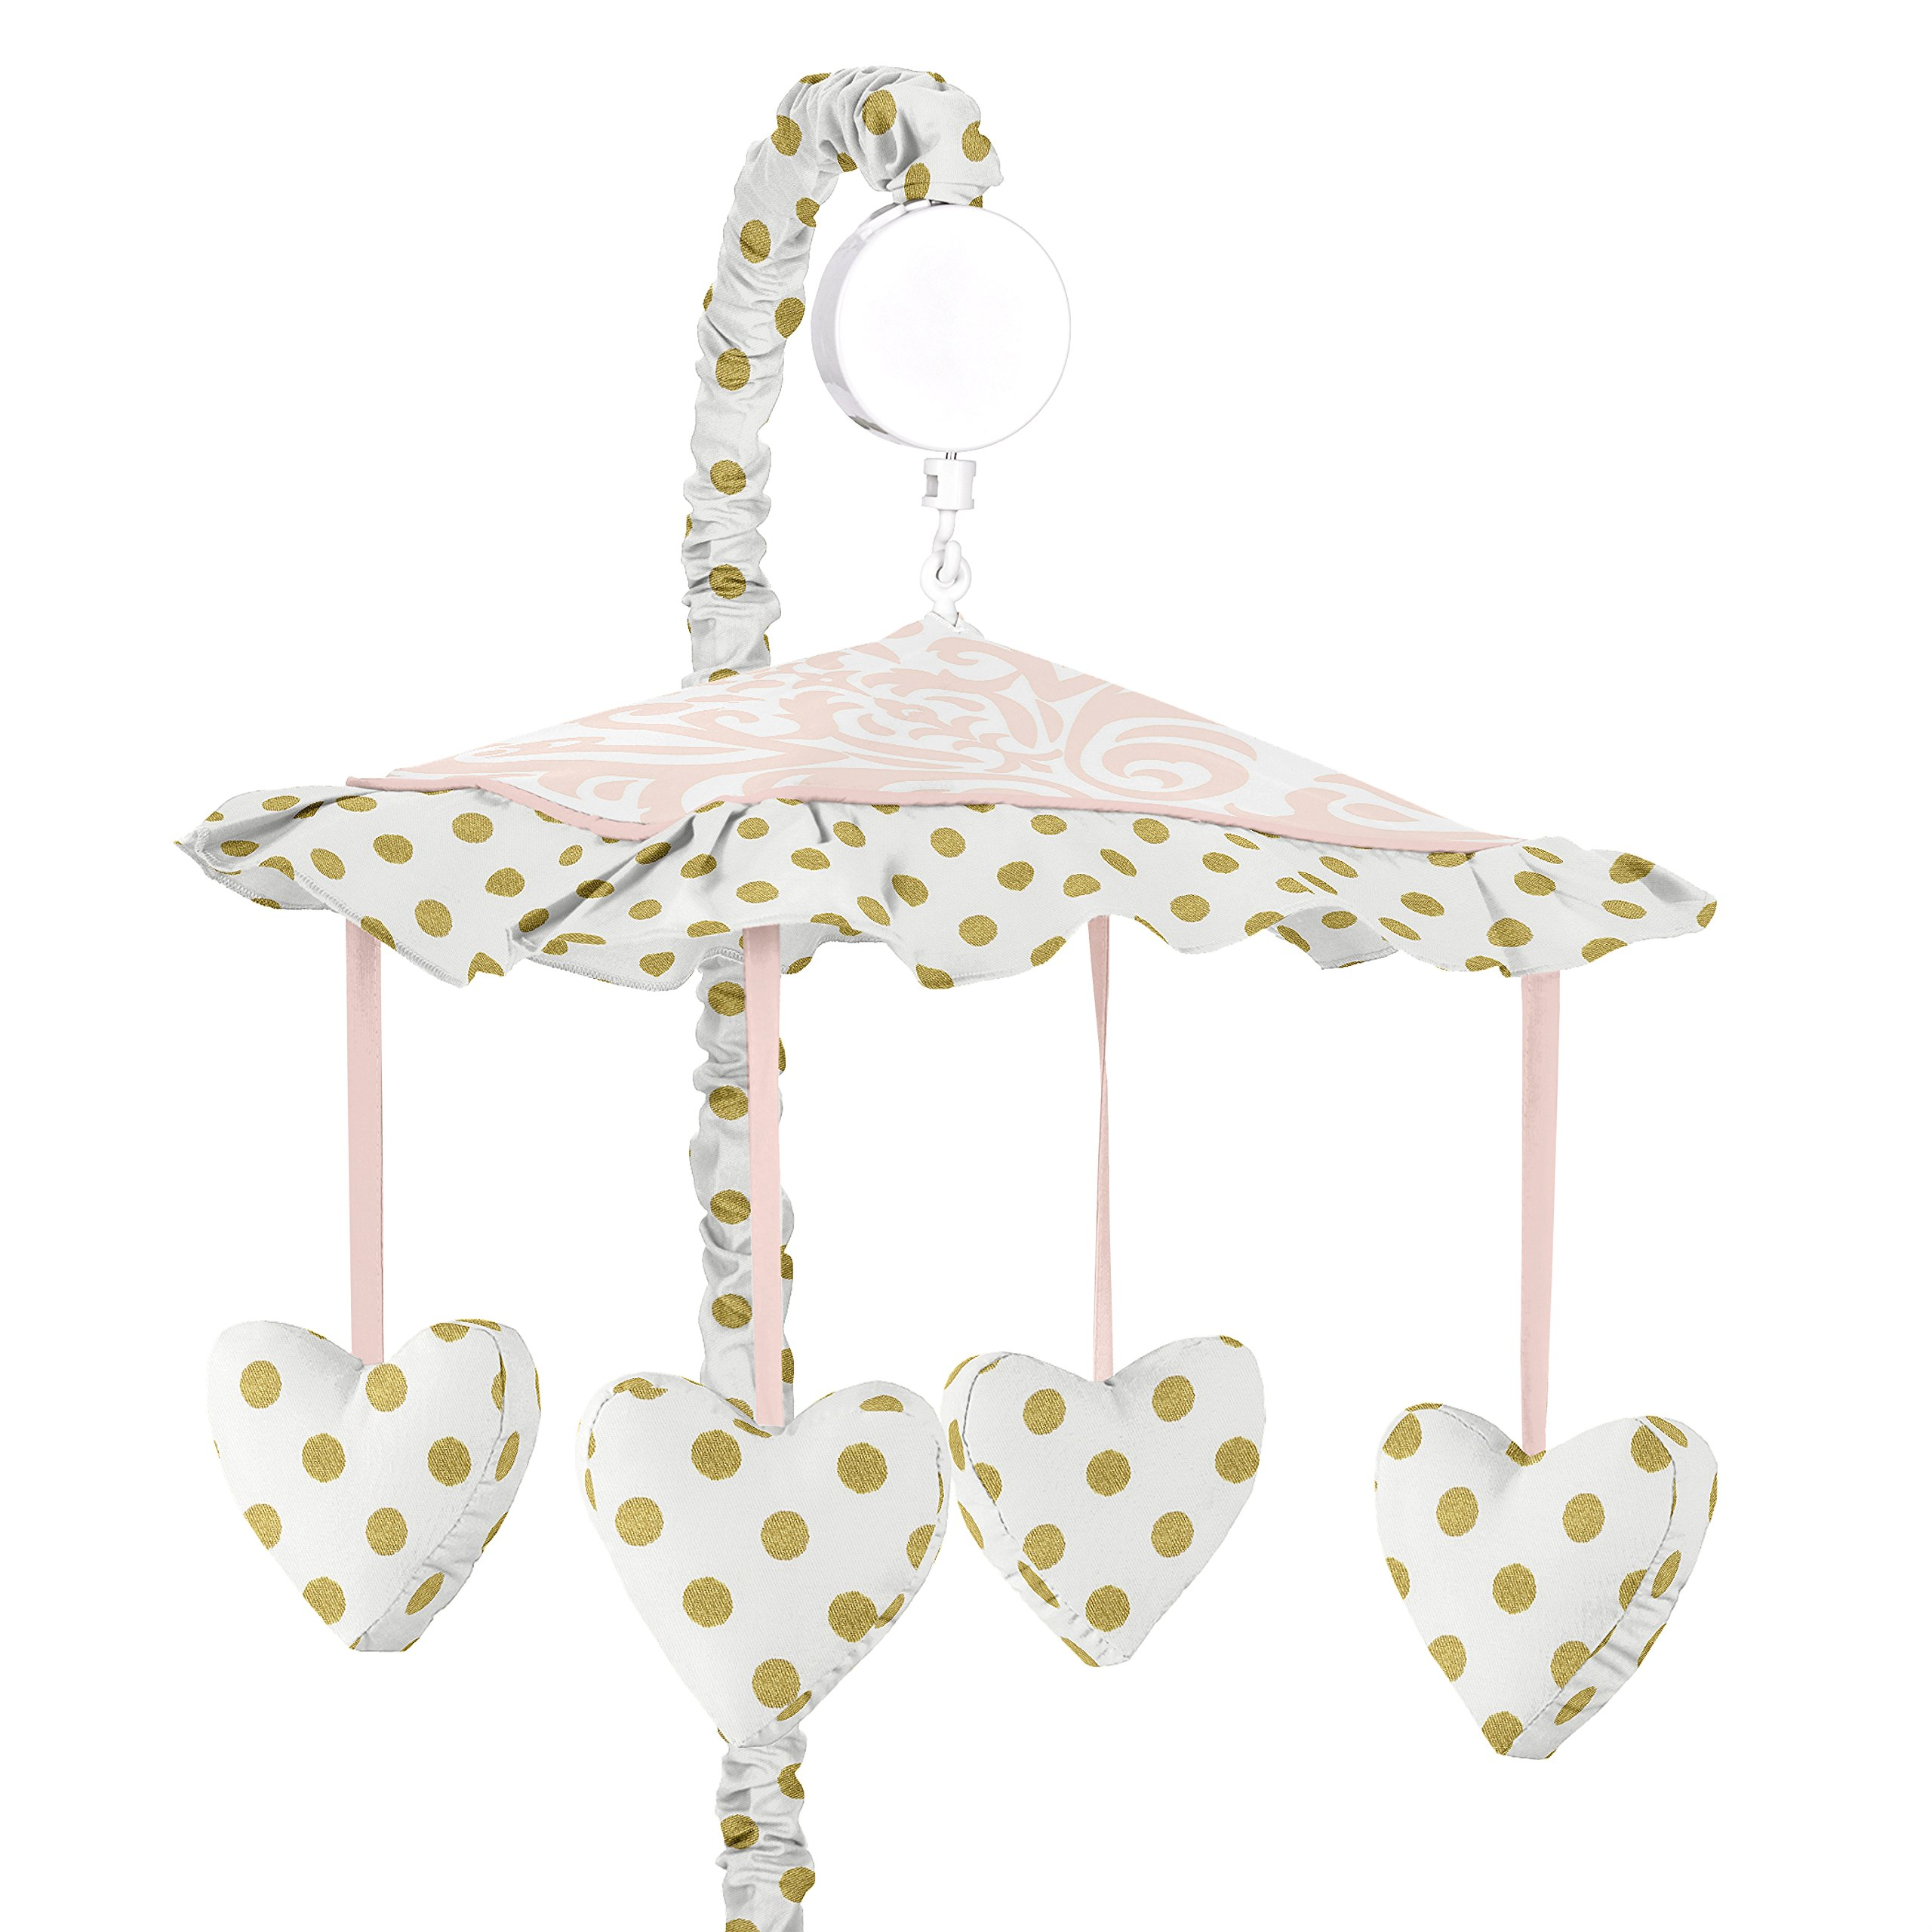 Sweet Jojo Designs Girls Musical Baby Crib Mobile for Pink White Damask and Gold Polka Dot Amelia Collection